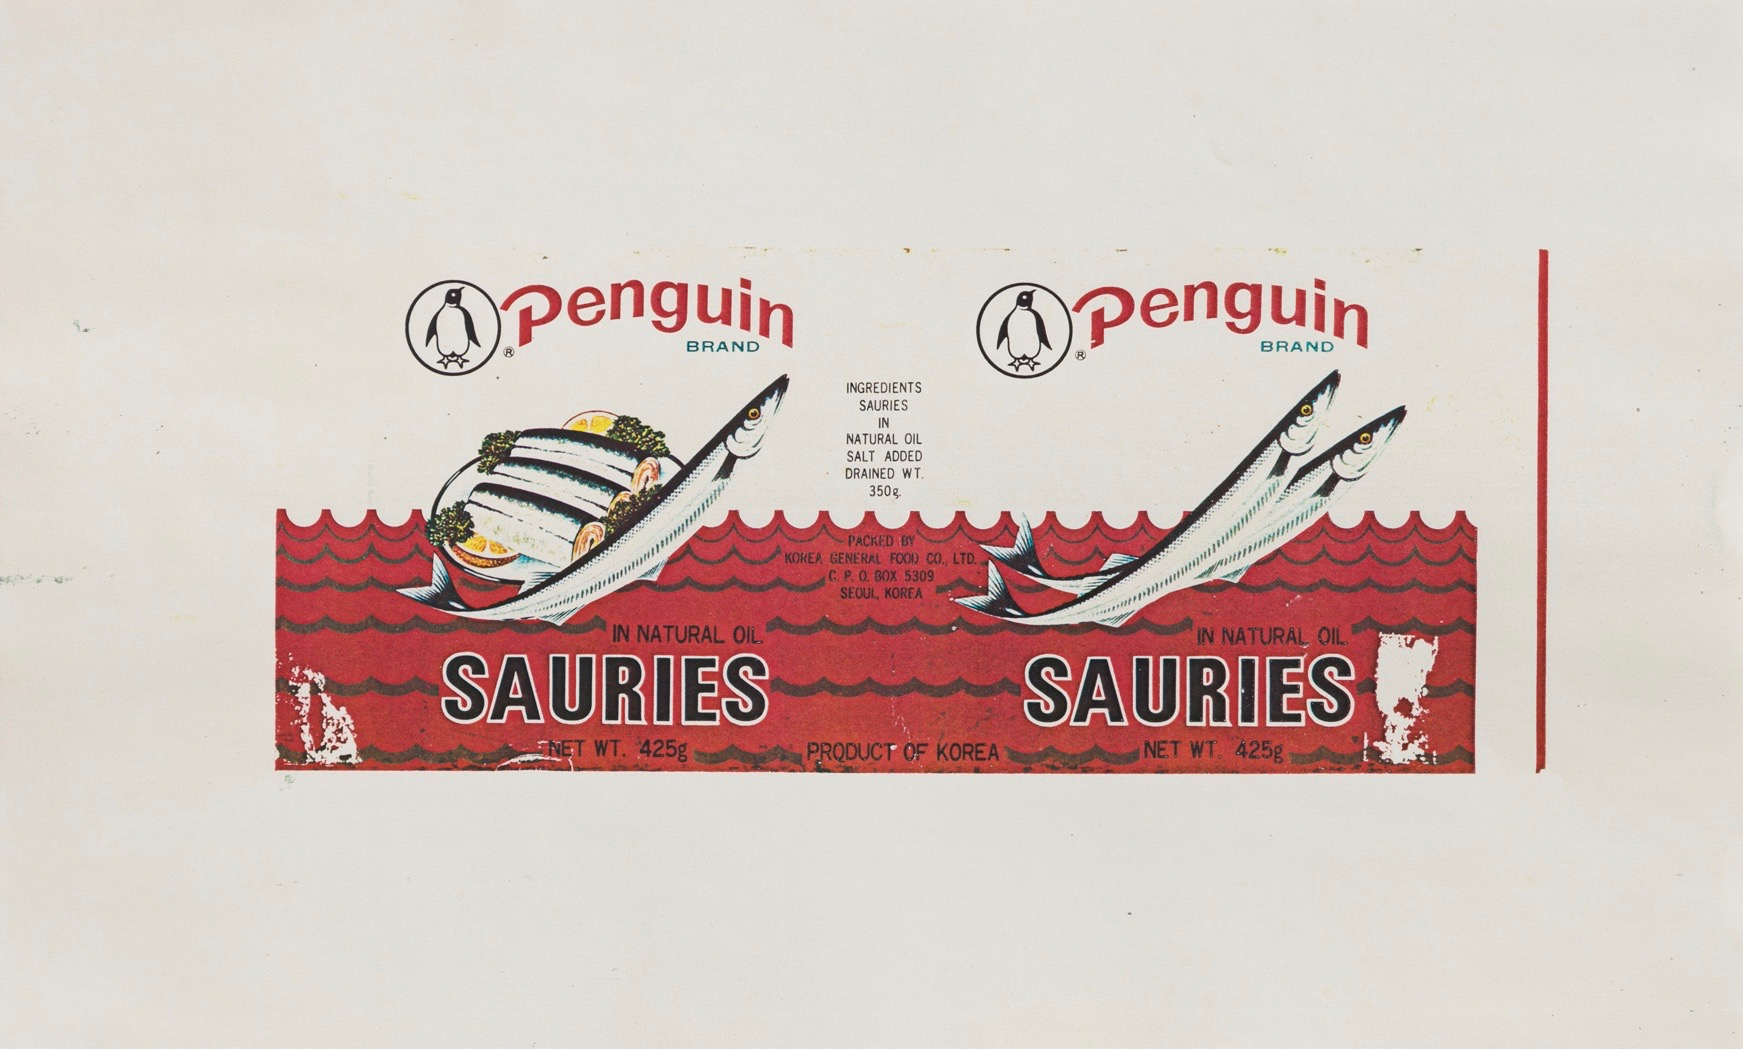 Hollis Frampton | Sauries Brand Penguin (1983)